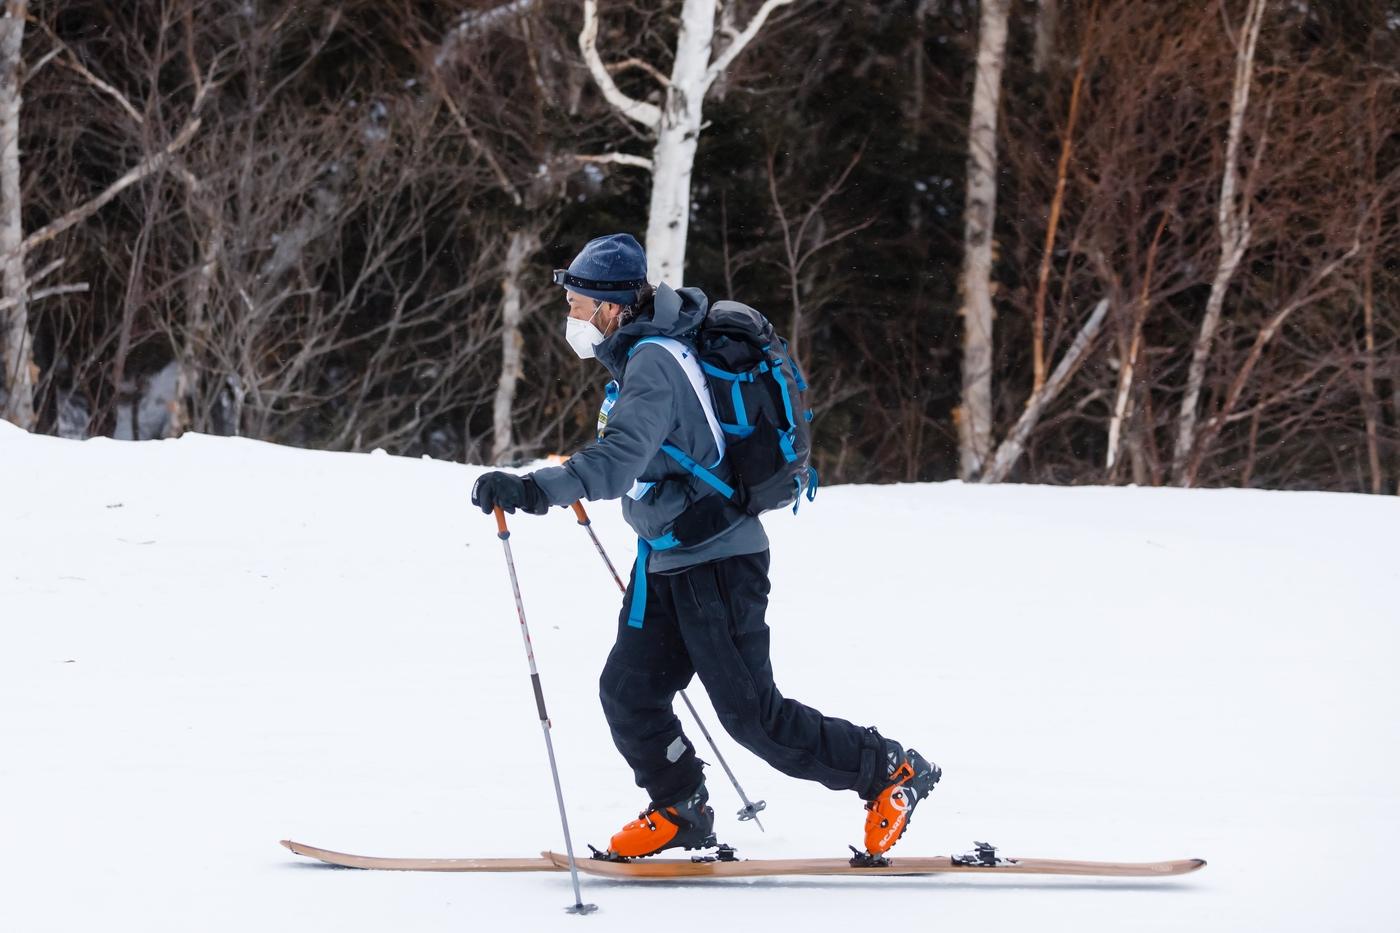 WinterKids Downhill 24 2021 SDP 3845